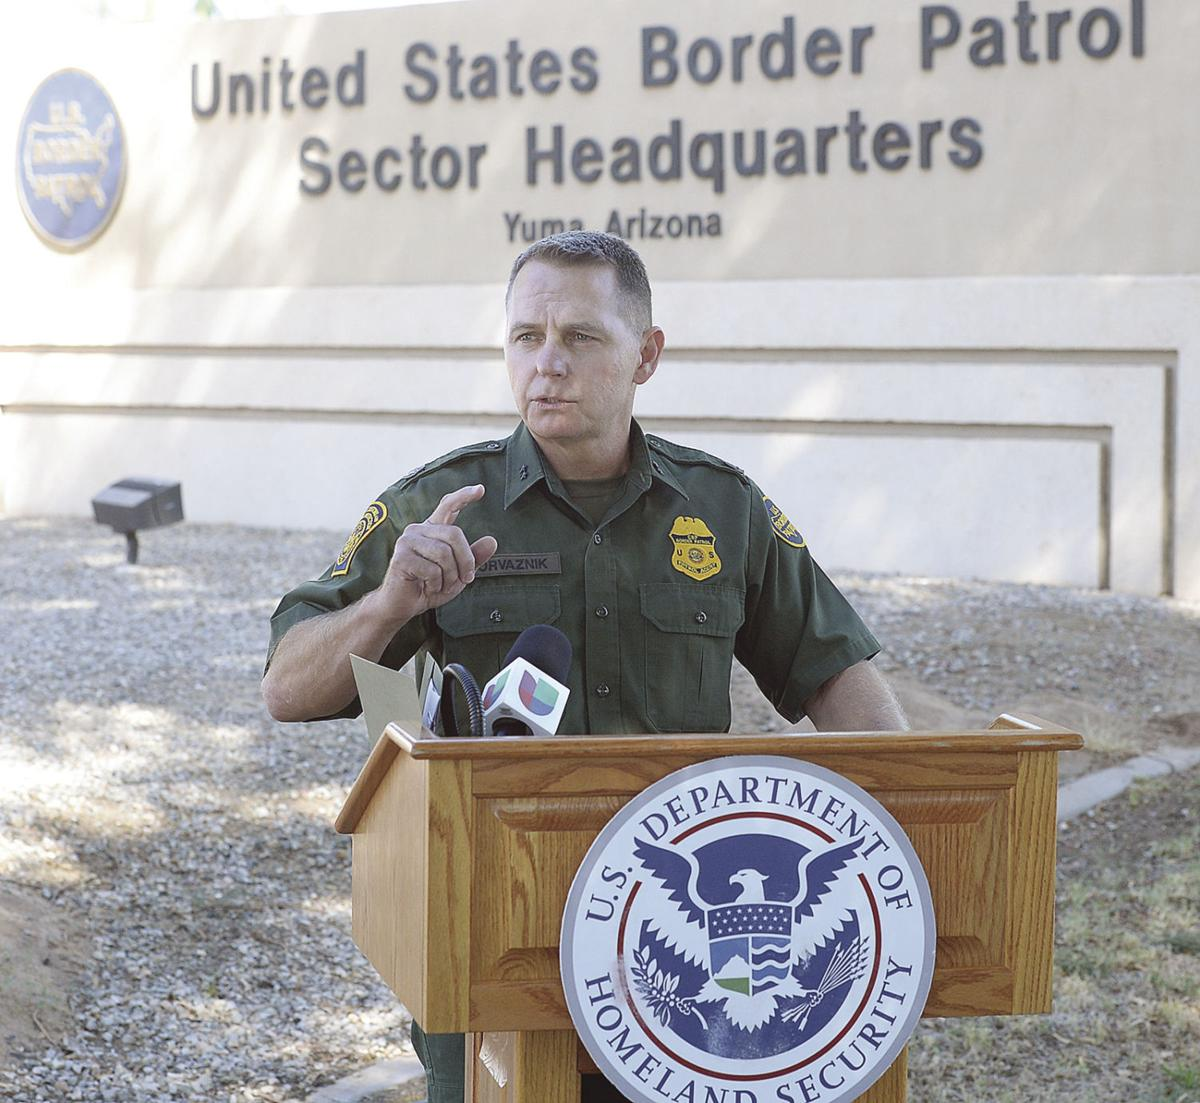 Border Patrol 2